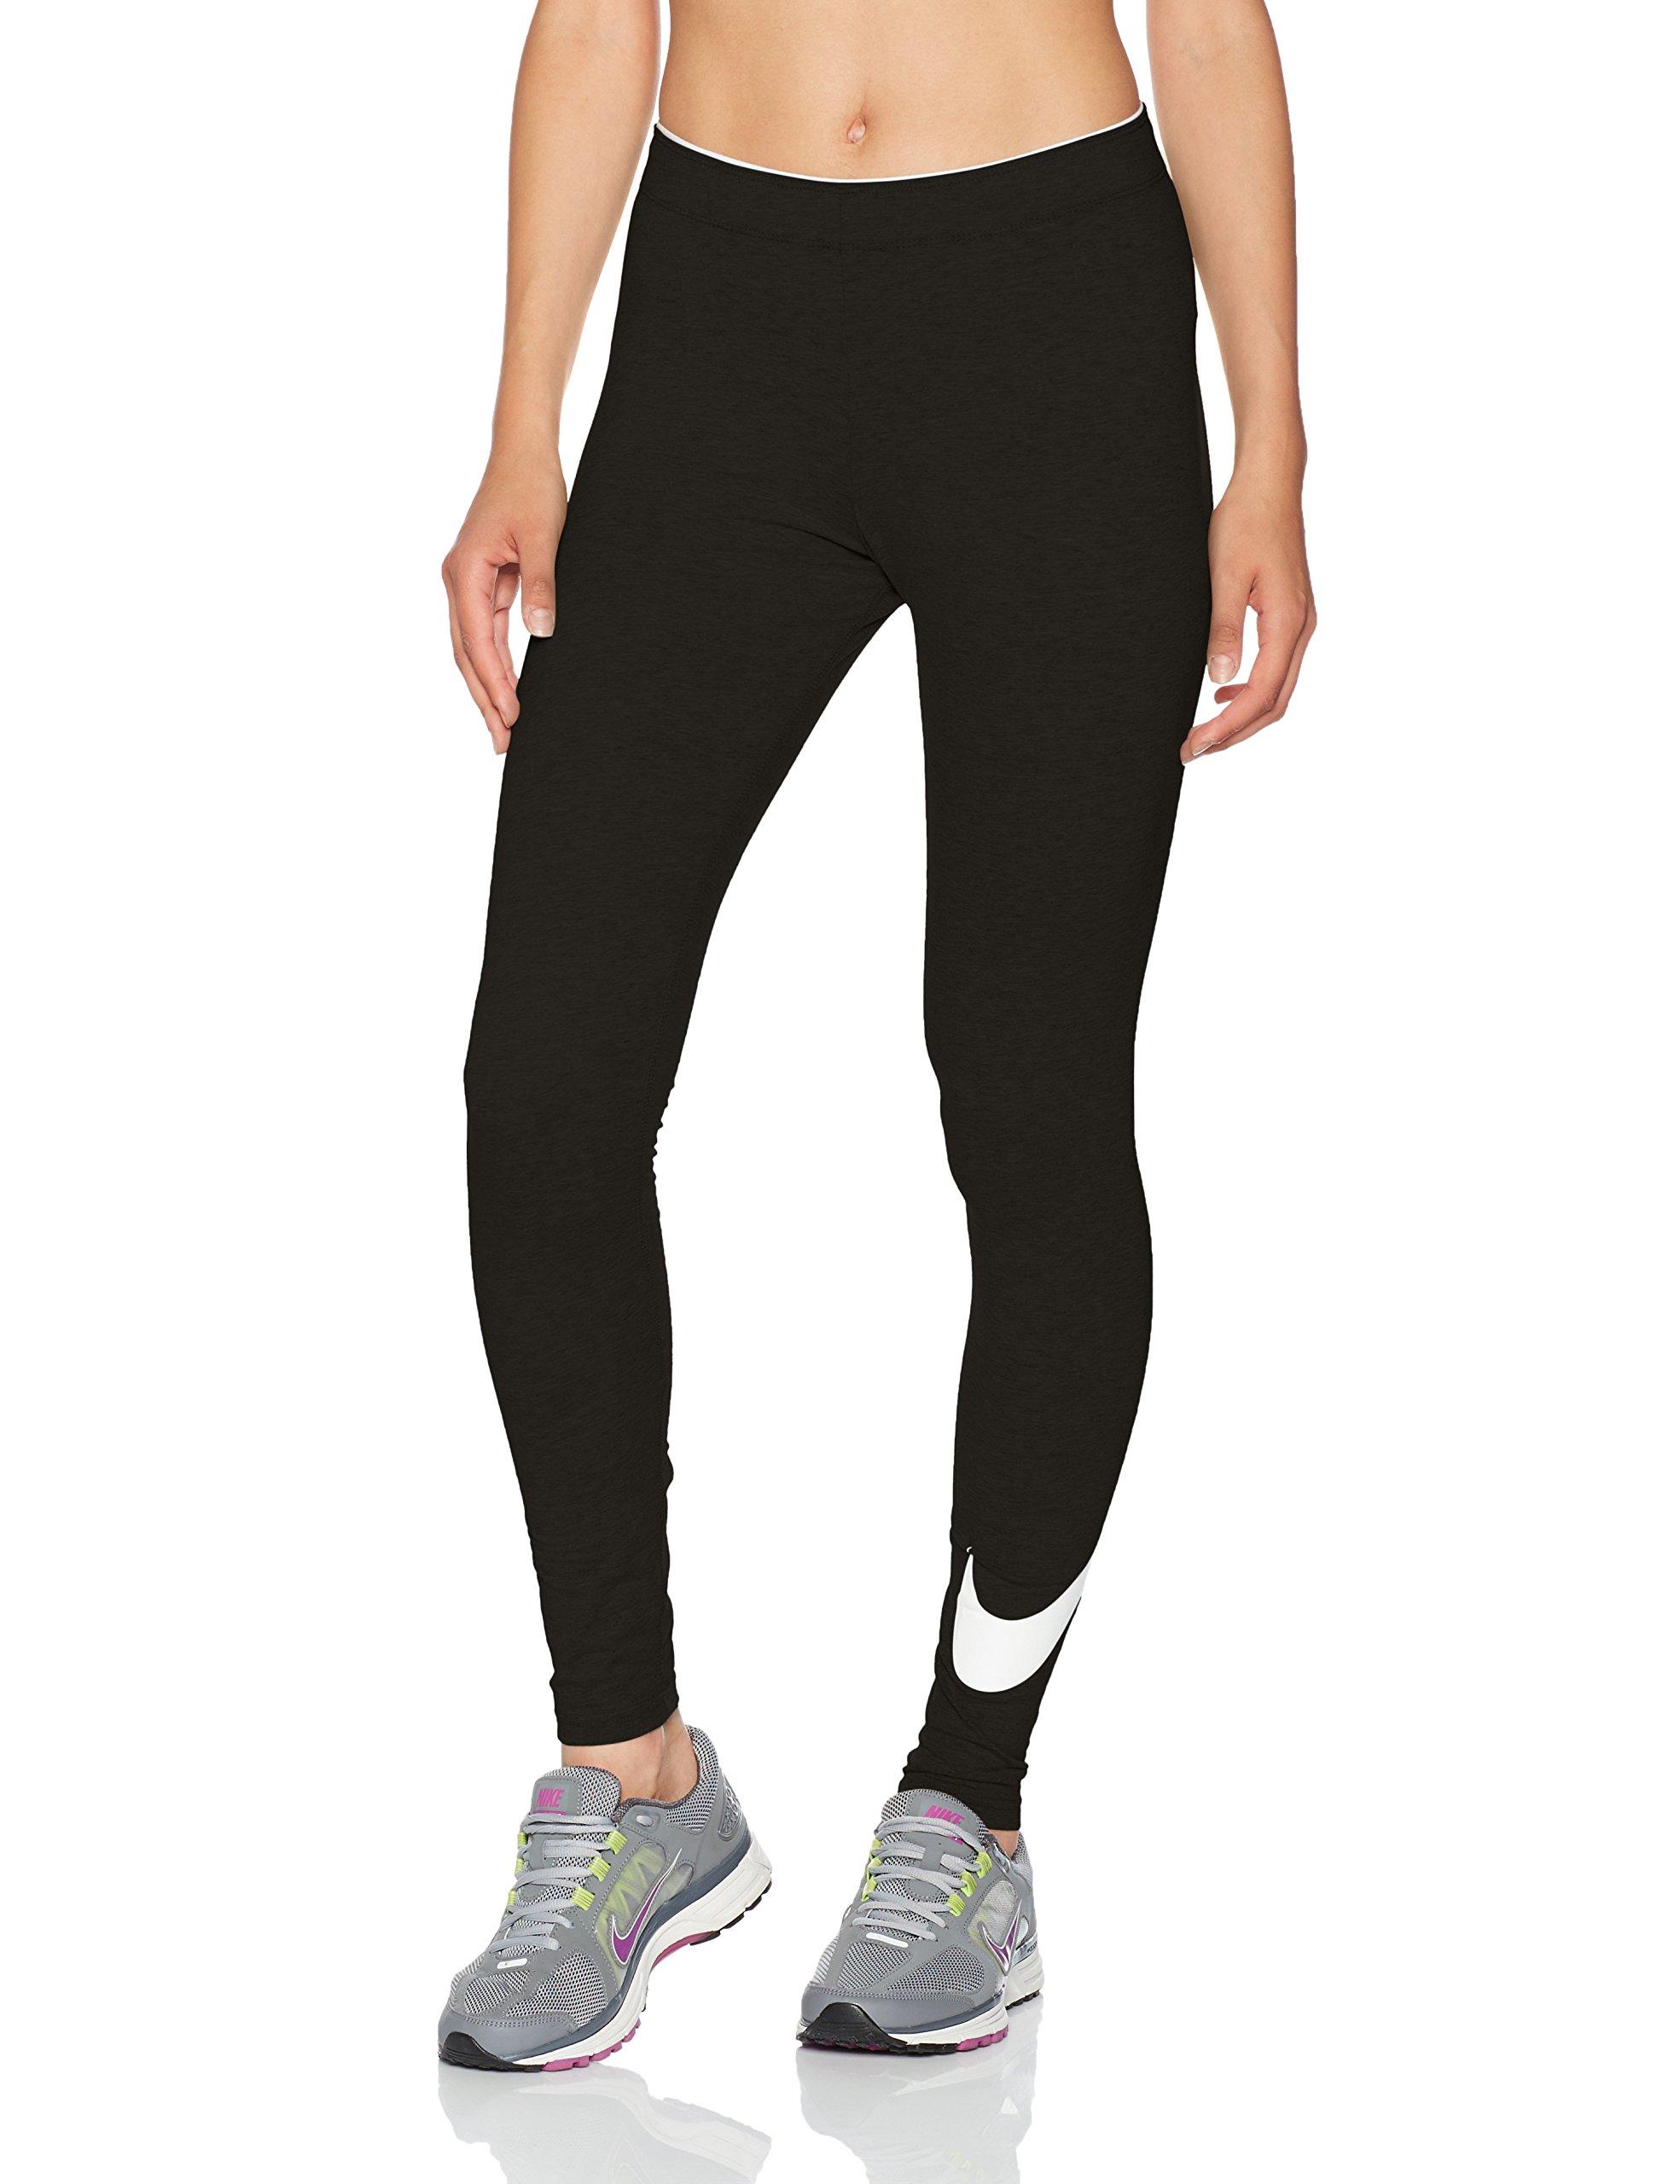 Nike - W NSW lggng Club logo2 - Collant pour femme product image d02ebb88f11